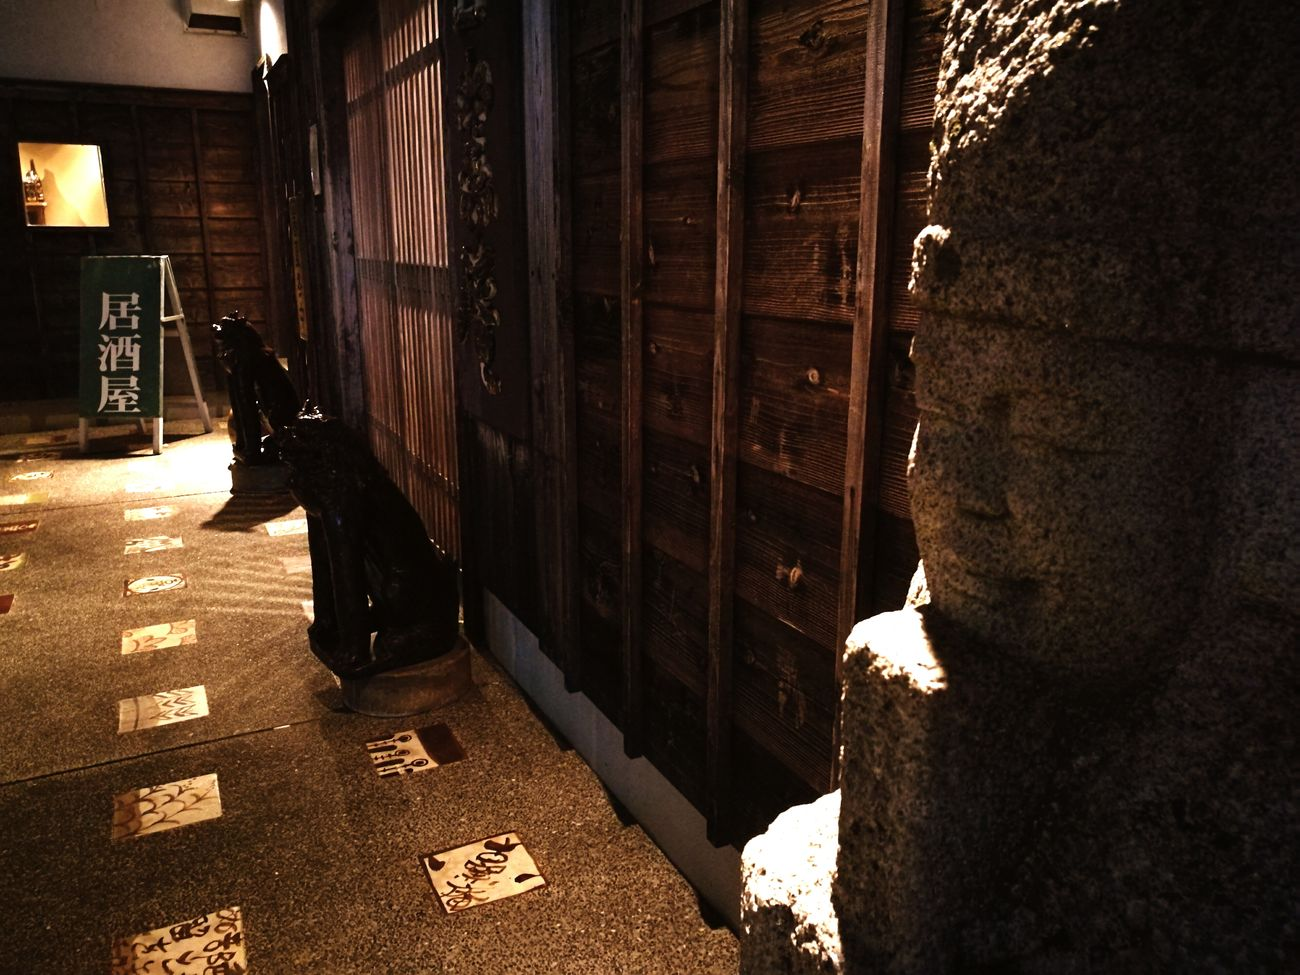 Izakaya Light And Shadow Statue Japan Wabi-sabi Shop Drunk Nights Nostalgic